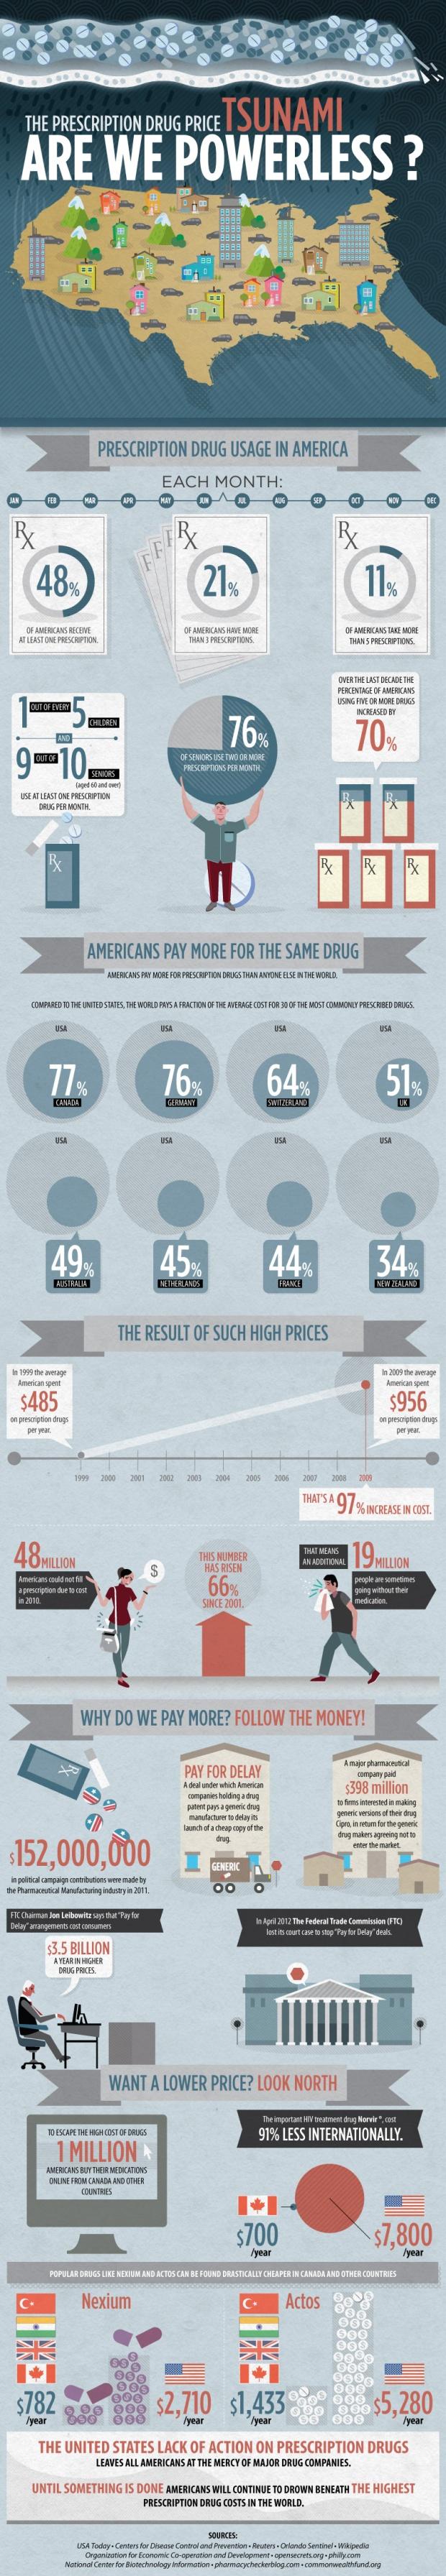 the-prescription-drug-price-tsunami--are-we-powerless_503bccb2cfa91